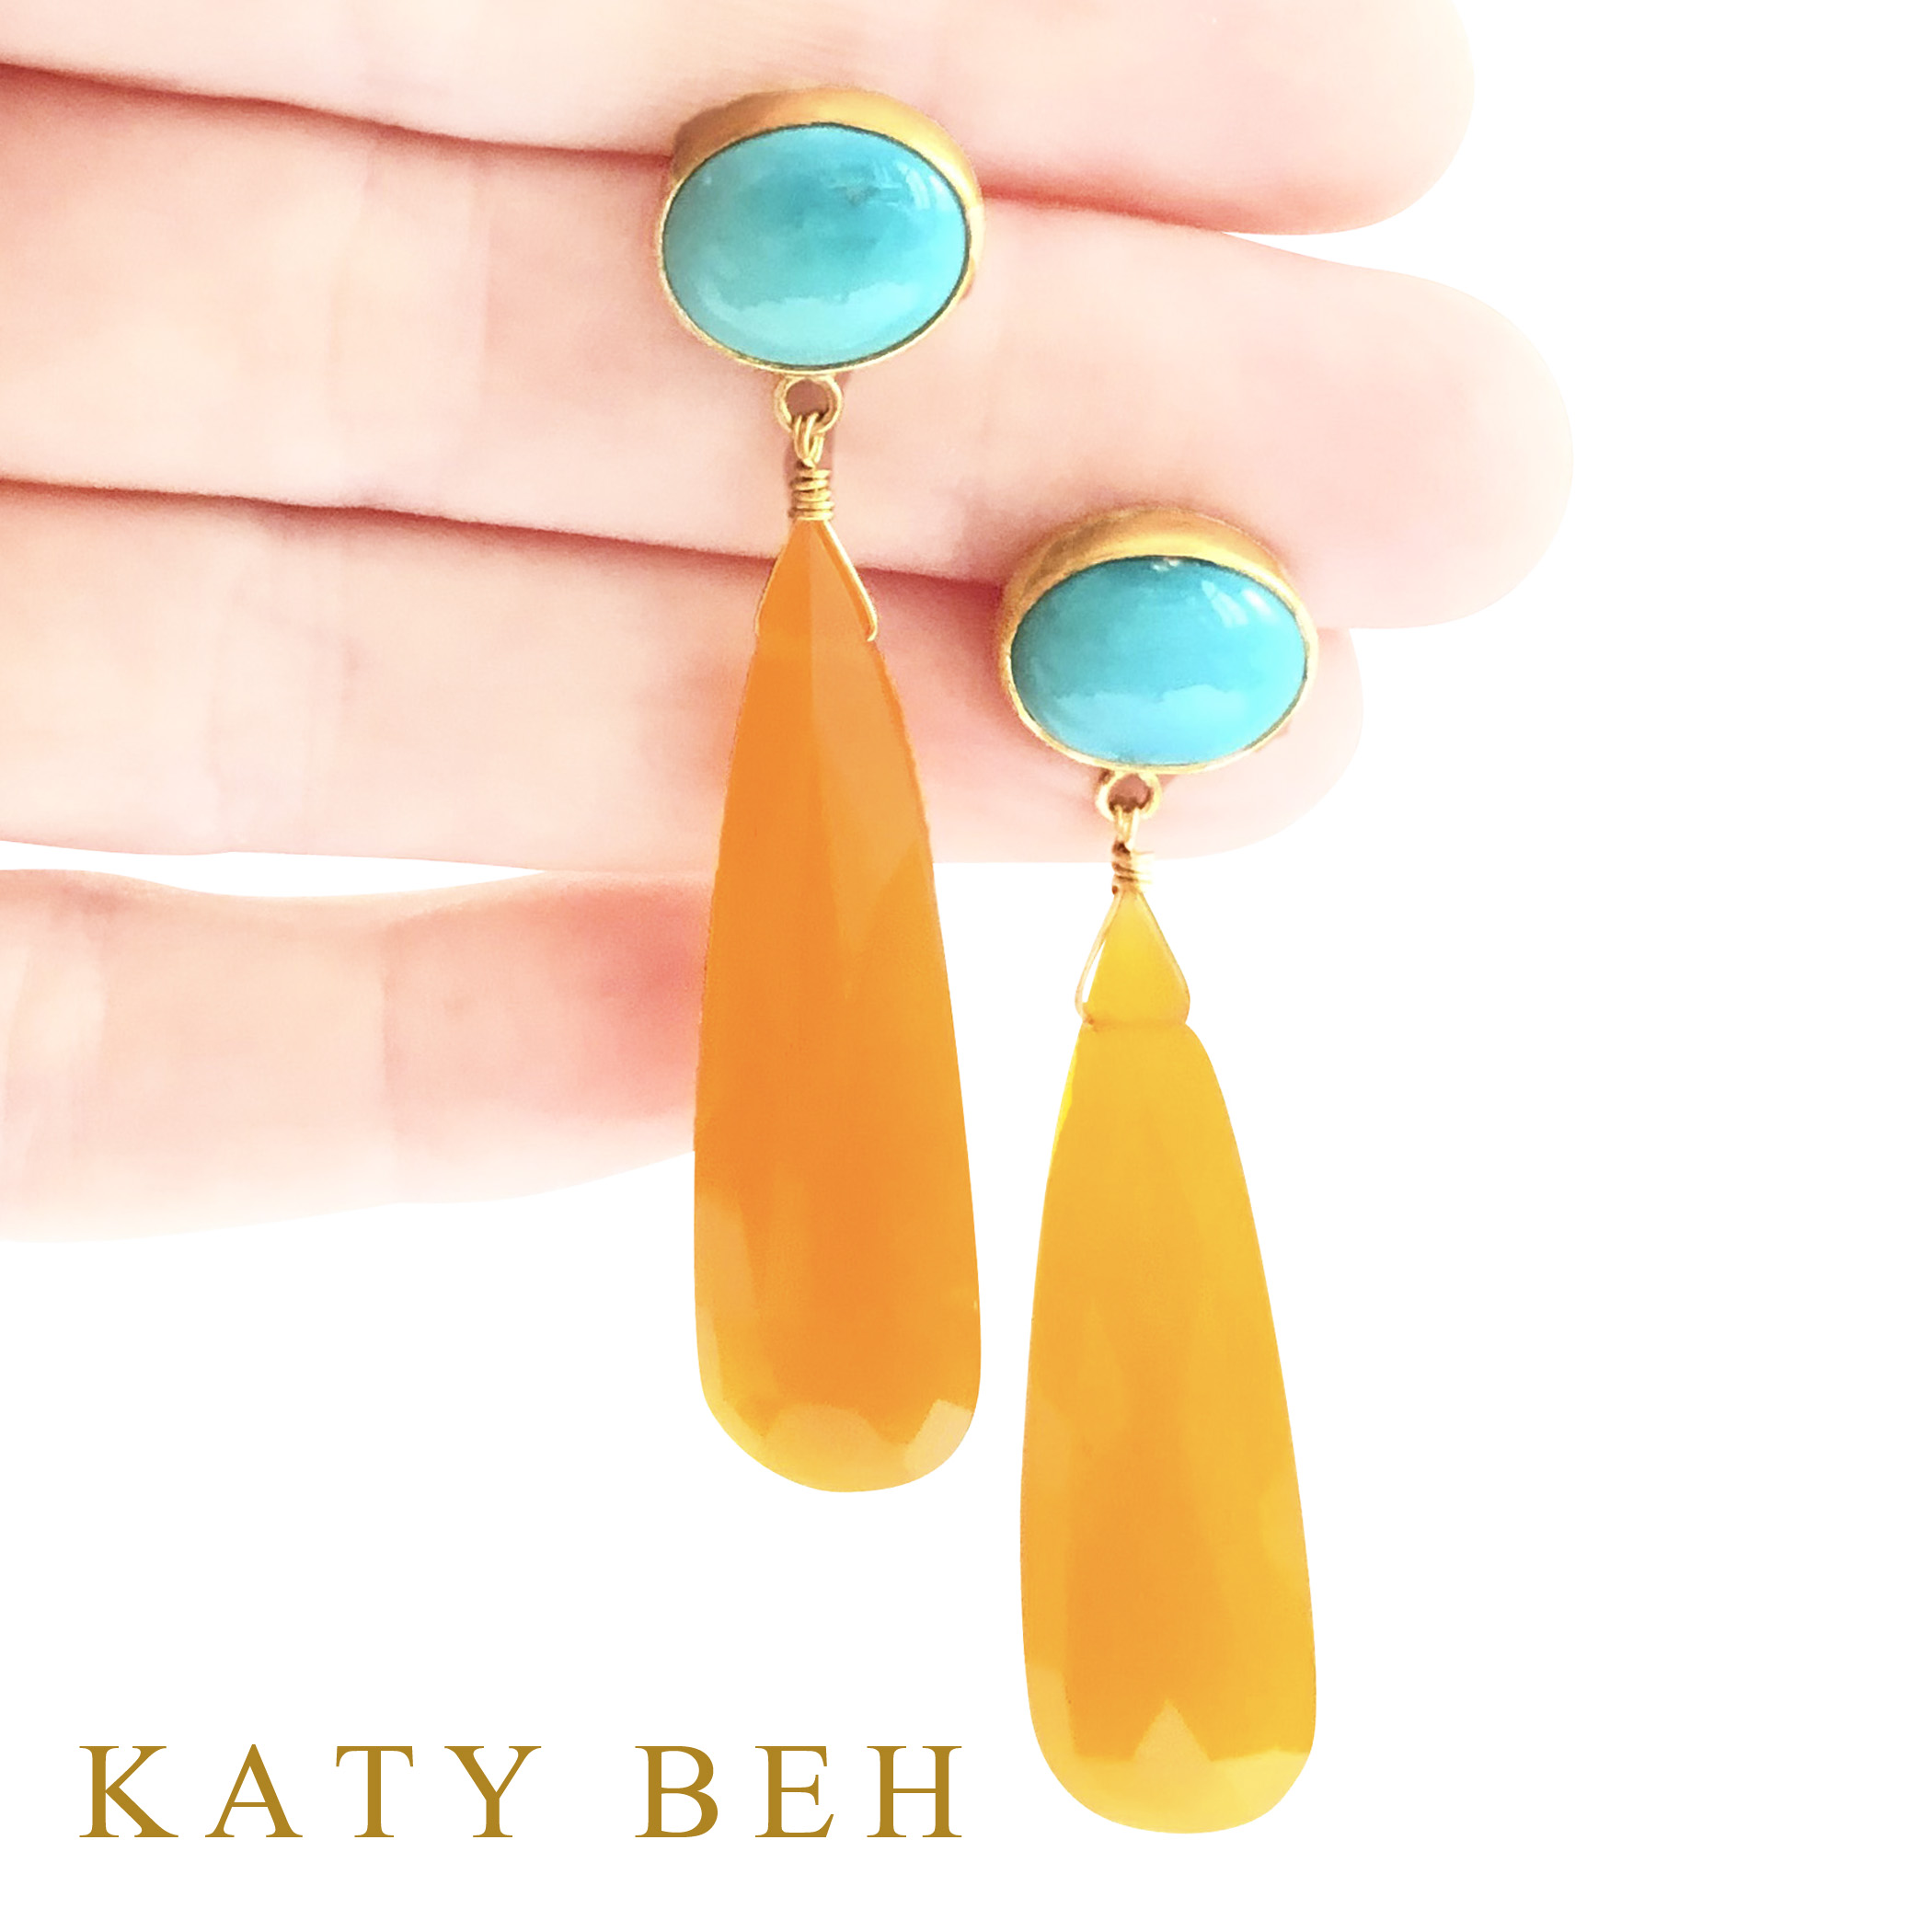 Gloria_Turquoise_Orange_Chalcedony_Earrings_22k_Gold_Katy_Beh_Jewelry_New_Orleans_3